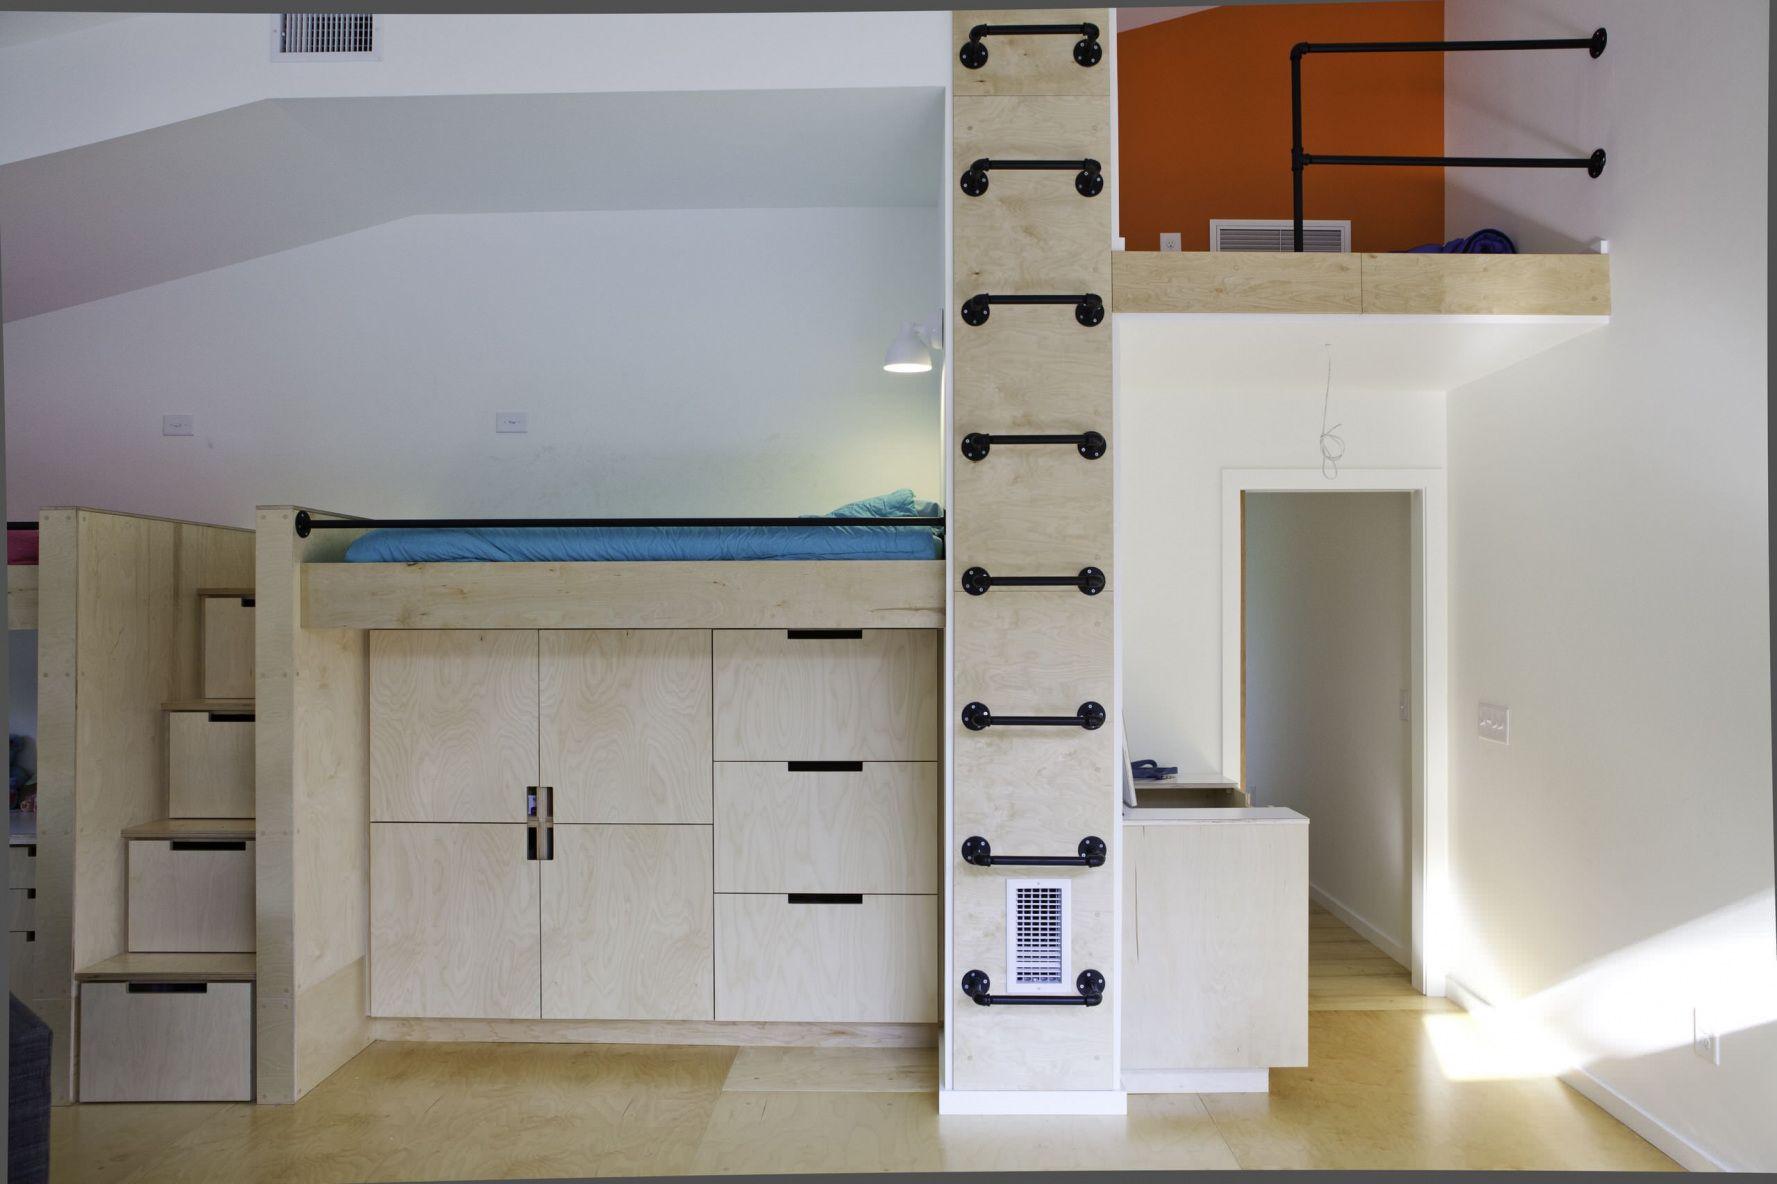 bunk bed ladders master bedroom interior design check more at